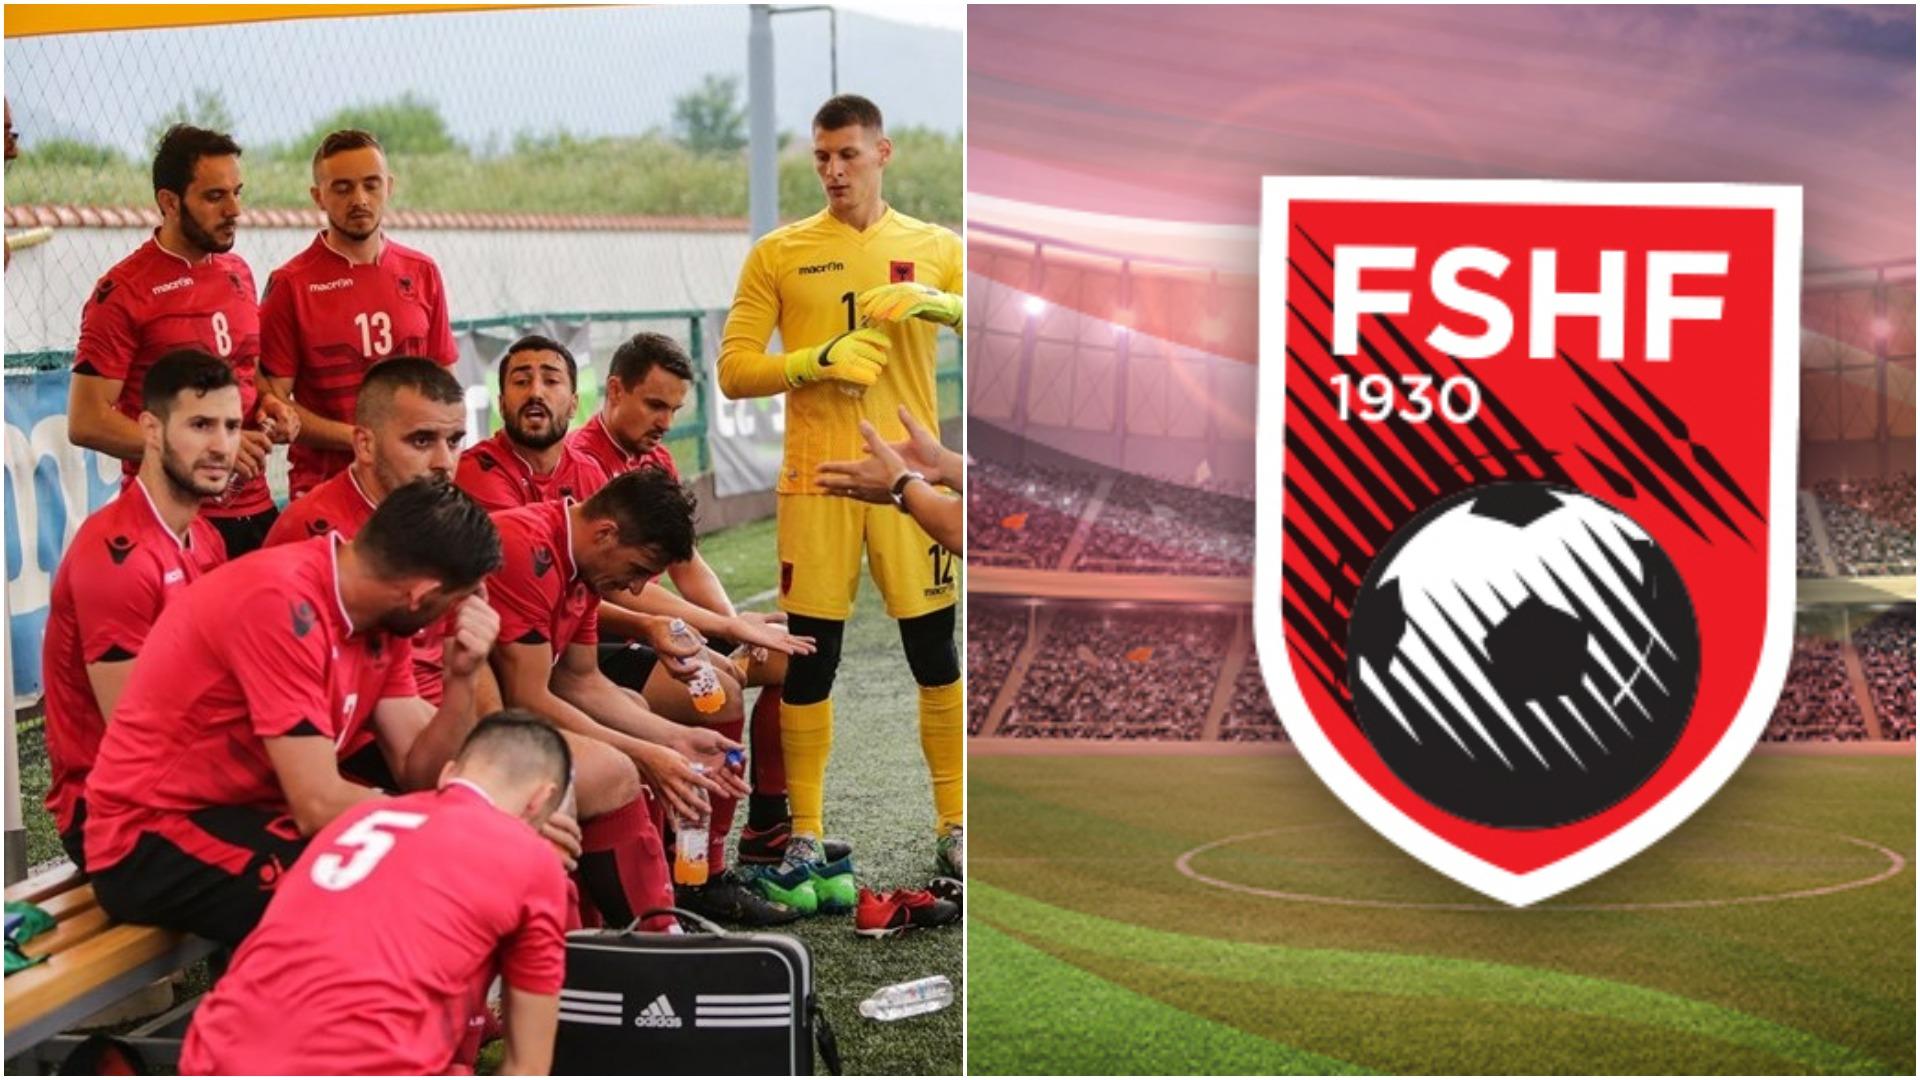 """Veprim banditesk! FSHF, kemi njoftuar UEFA-n dhe FIFA-n"""